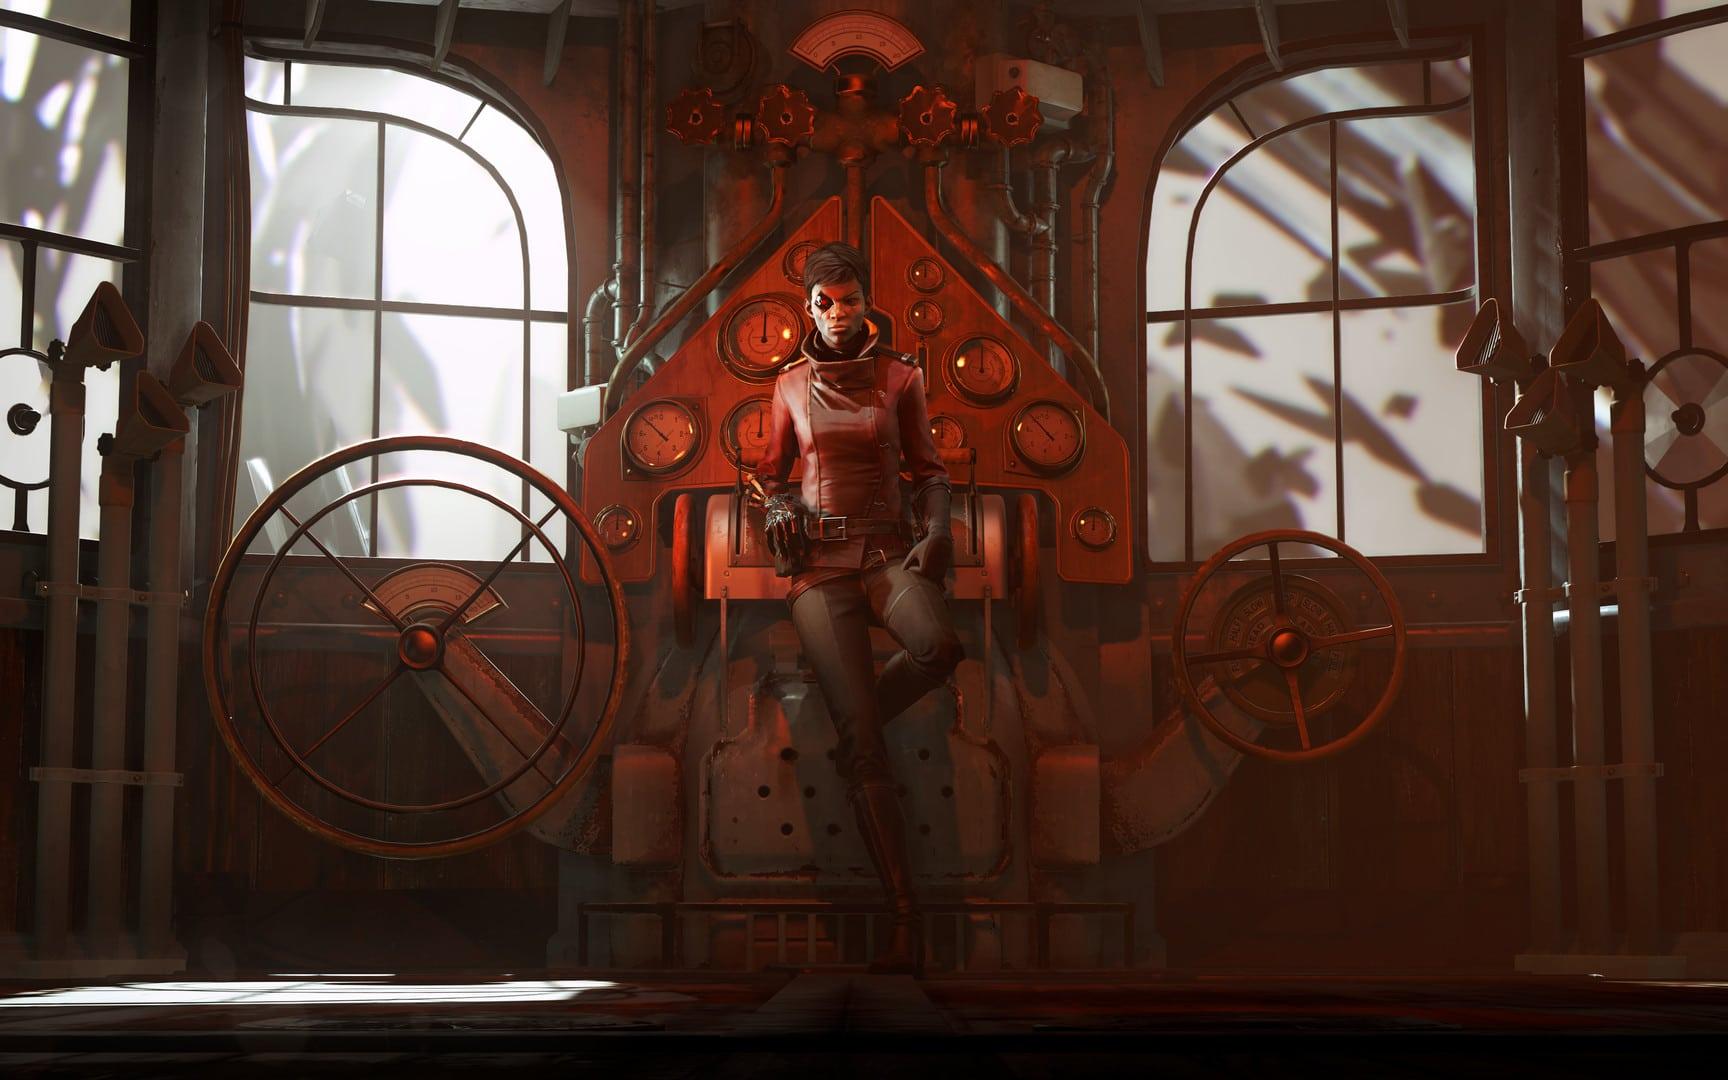 Dishonored: Death of the Outsider sucks Arkane Studios